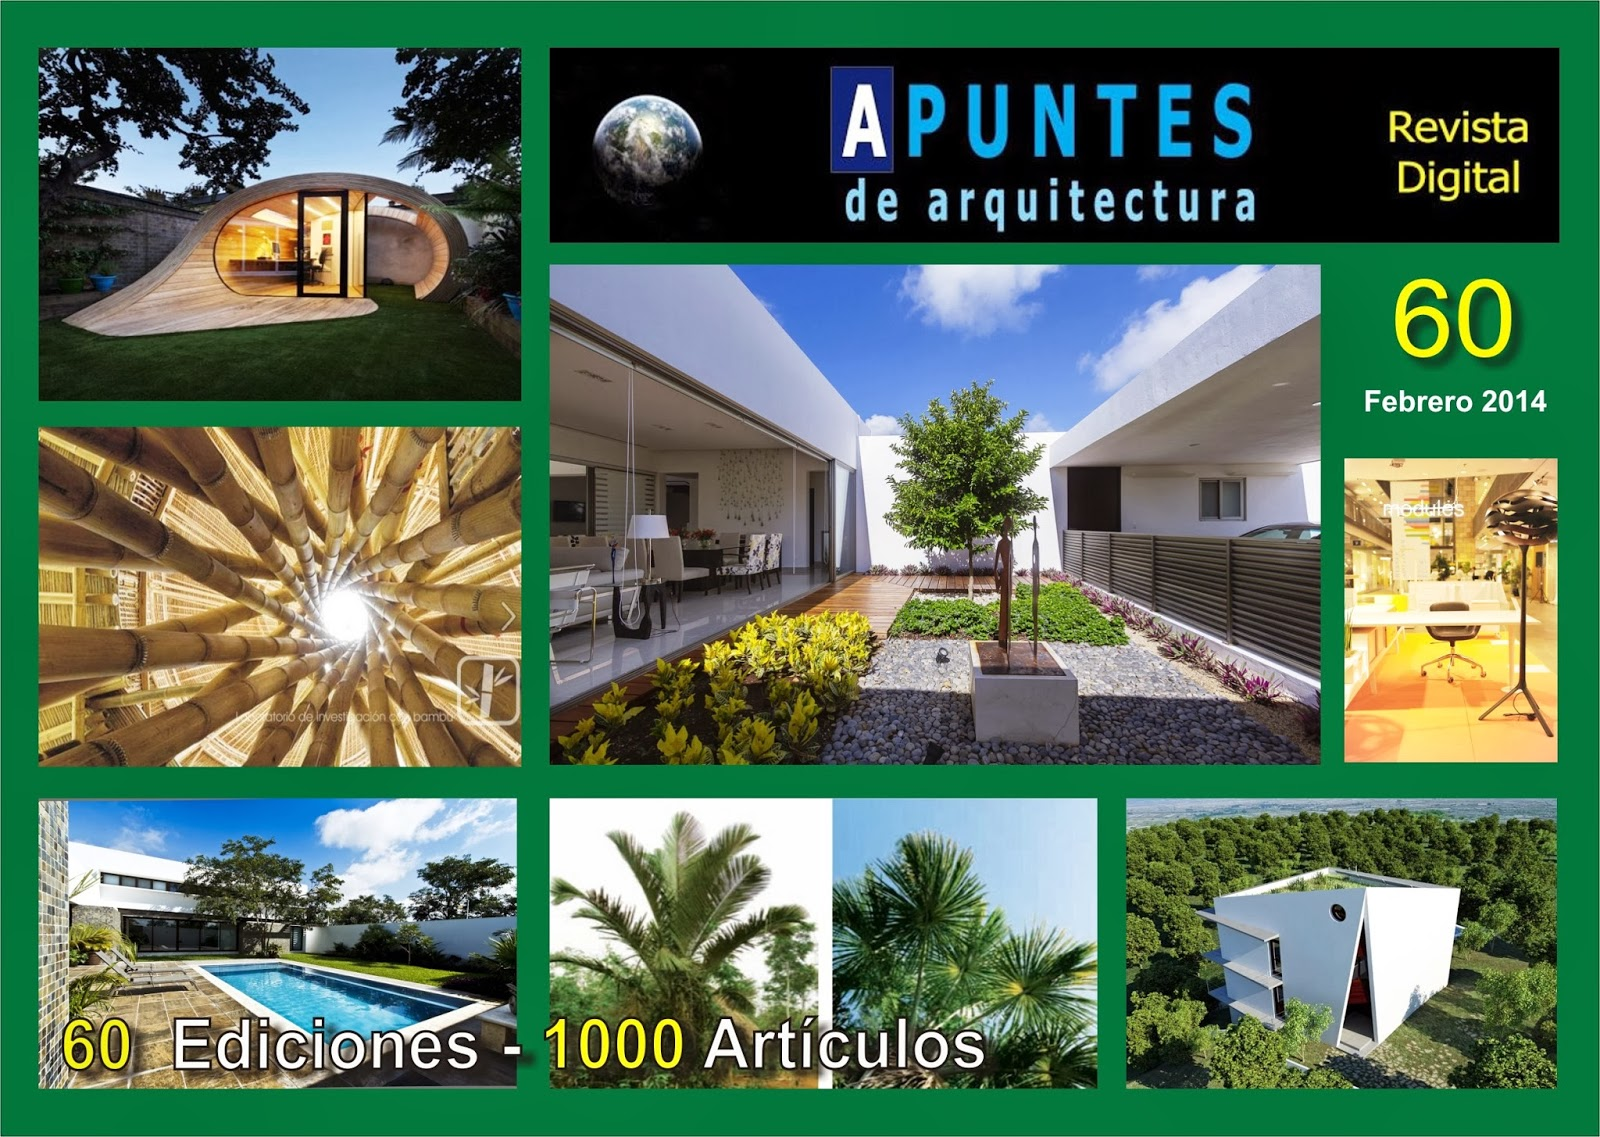 Apuntes revista digital de arquitectura revista digital for Articulos sobre arquitectura